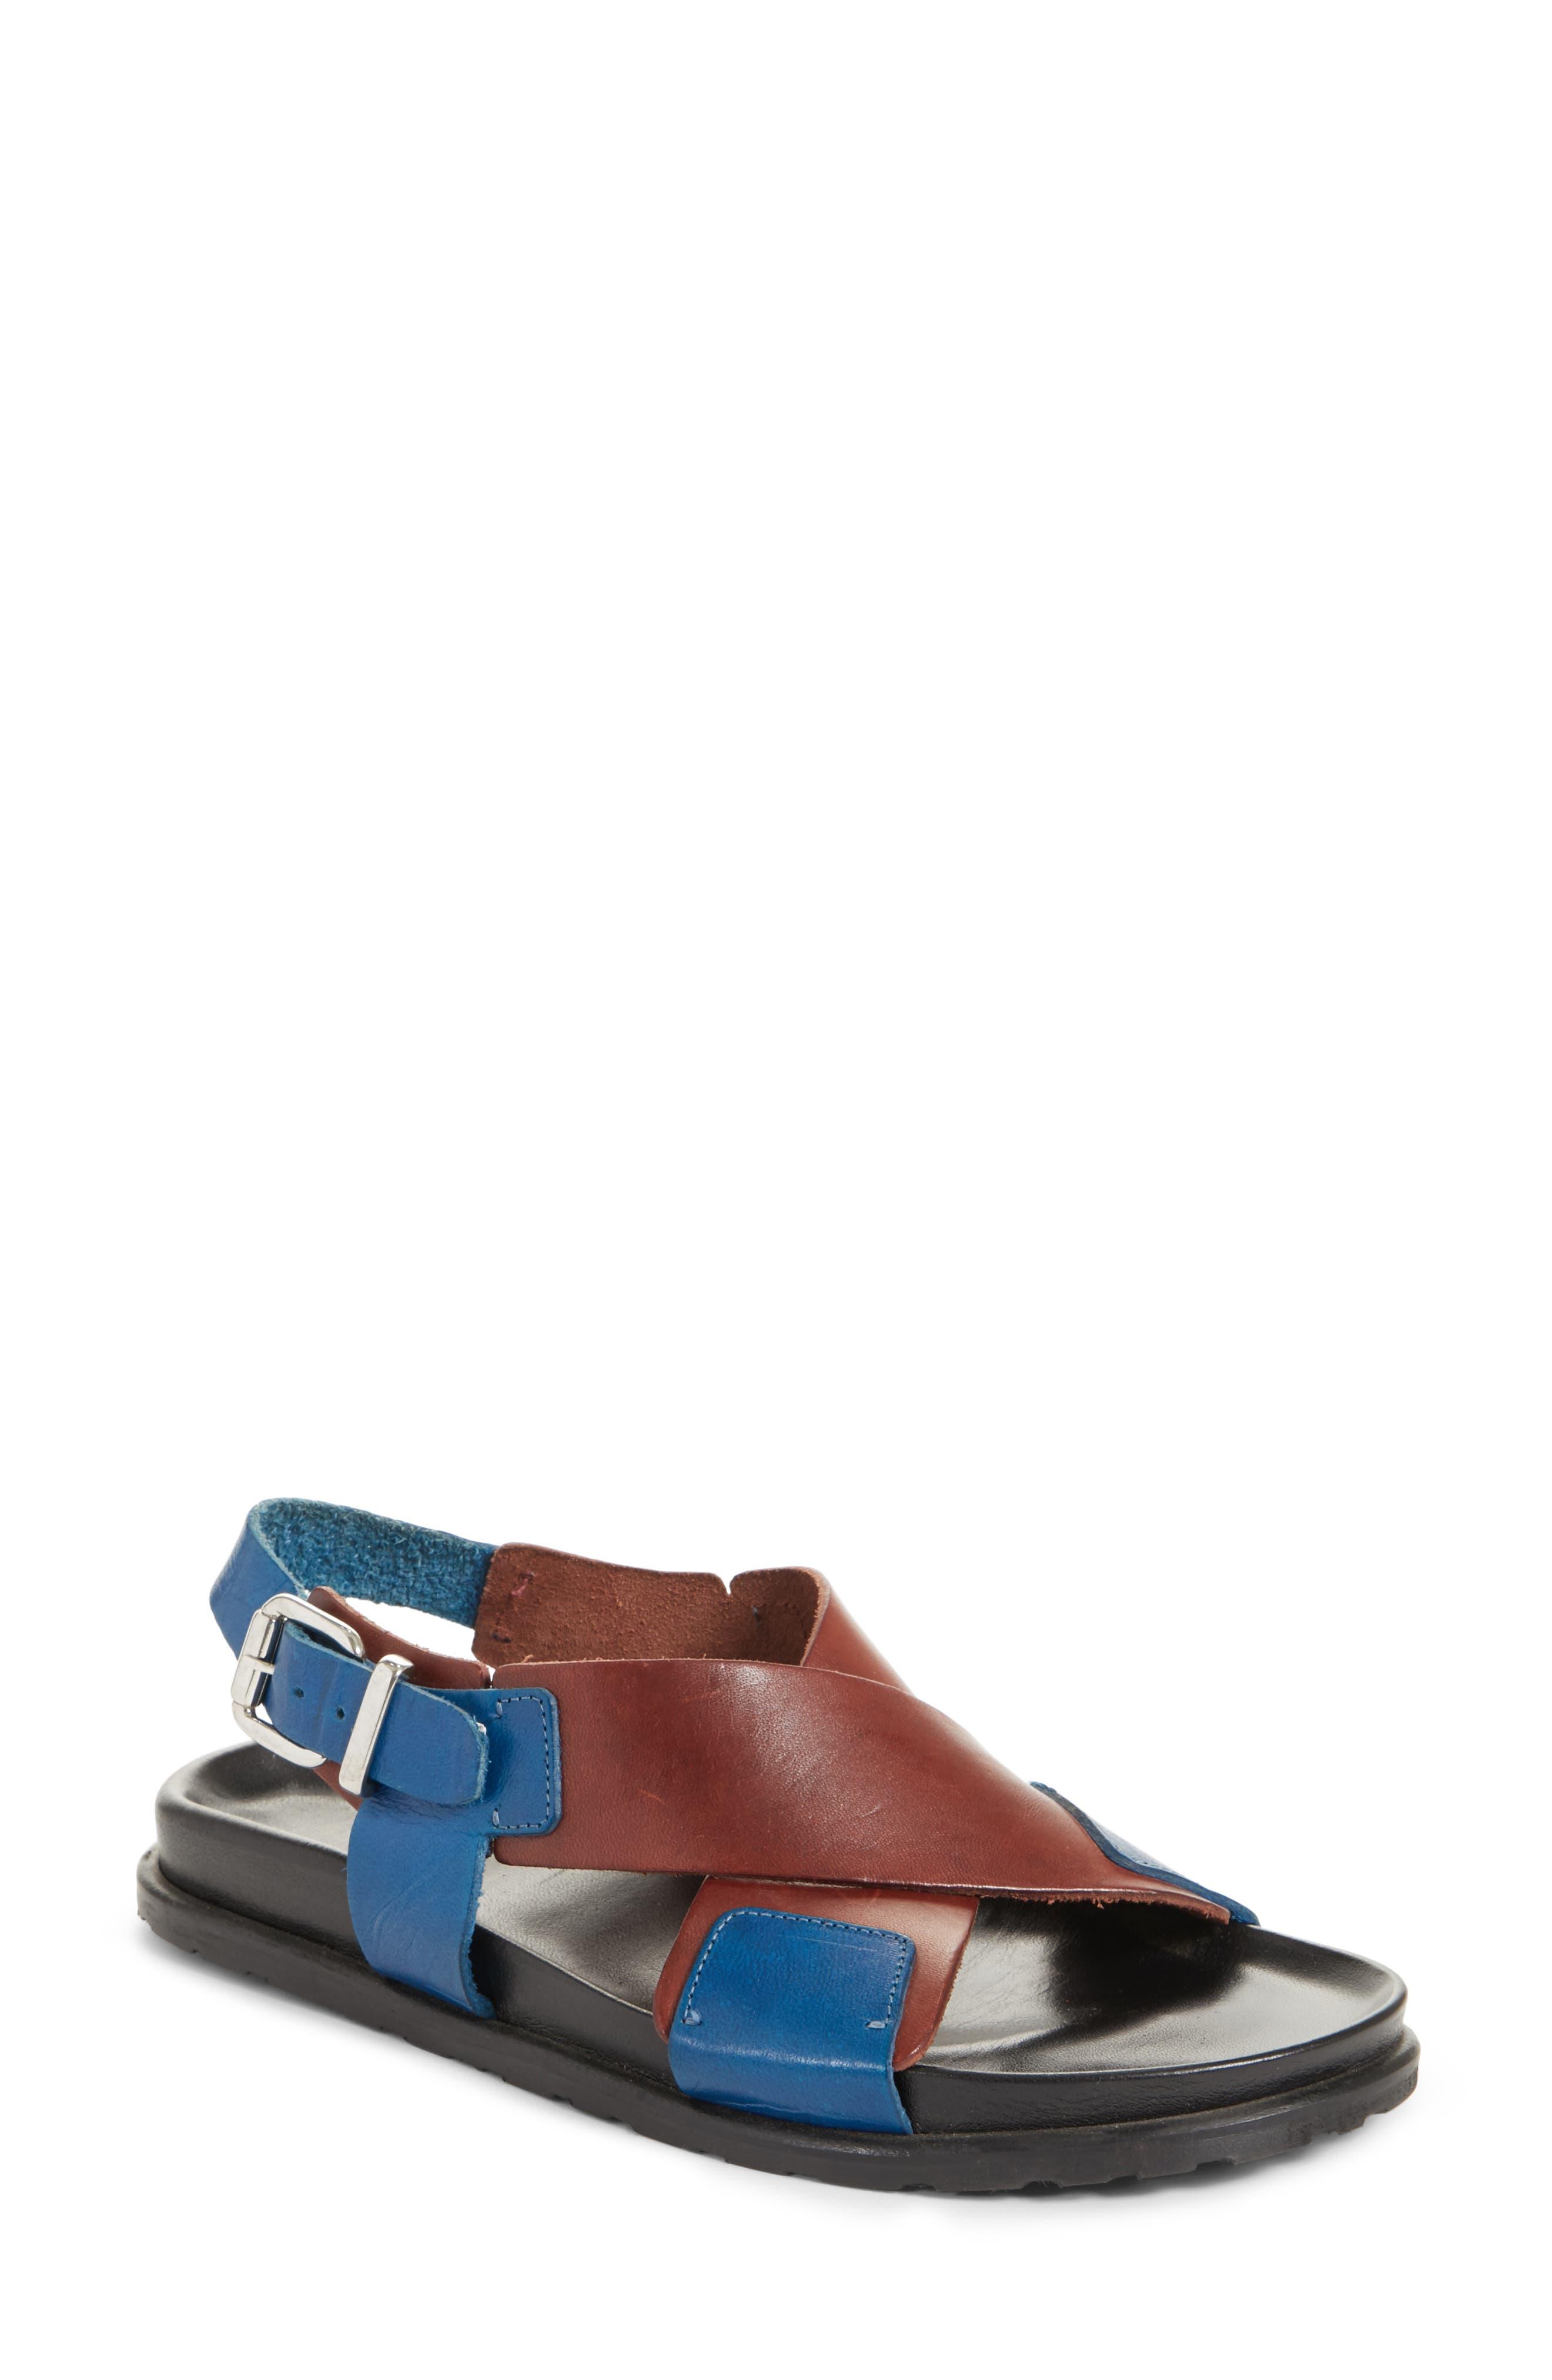 Bicolor Strappy Sandal,                             Main thumbnail 1, color,                             5Marsala/Denim